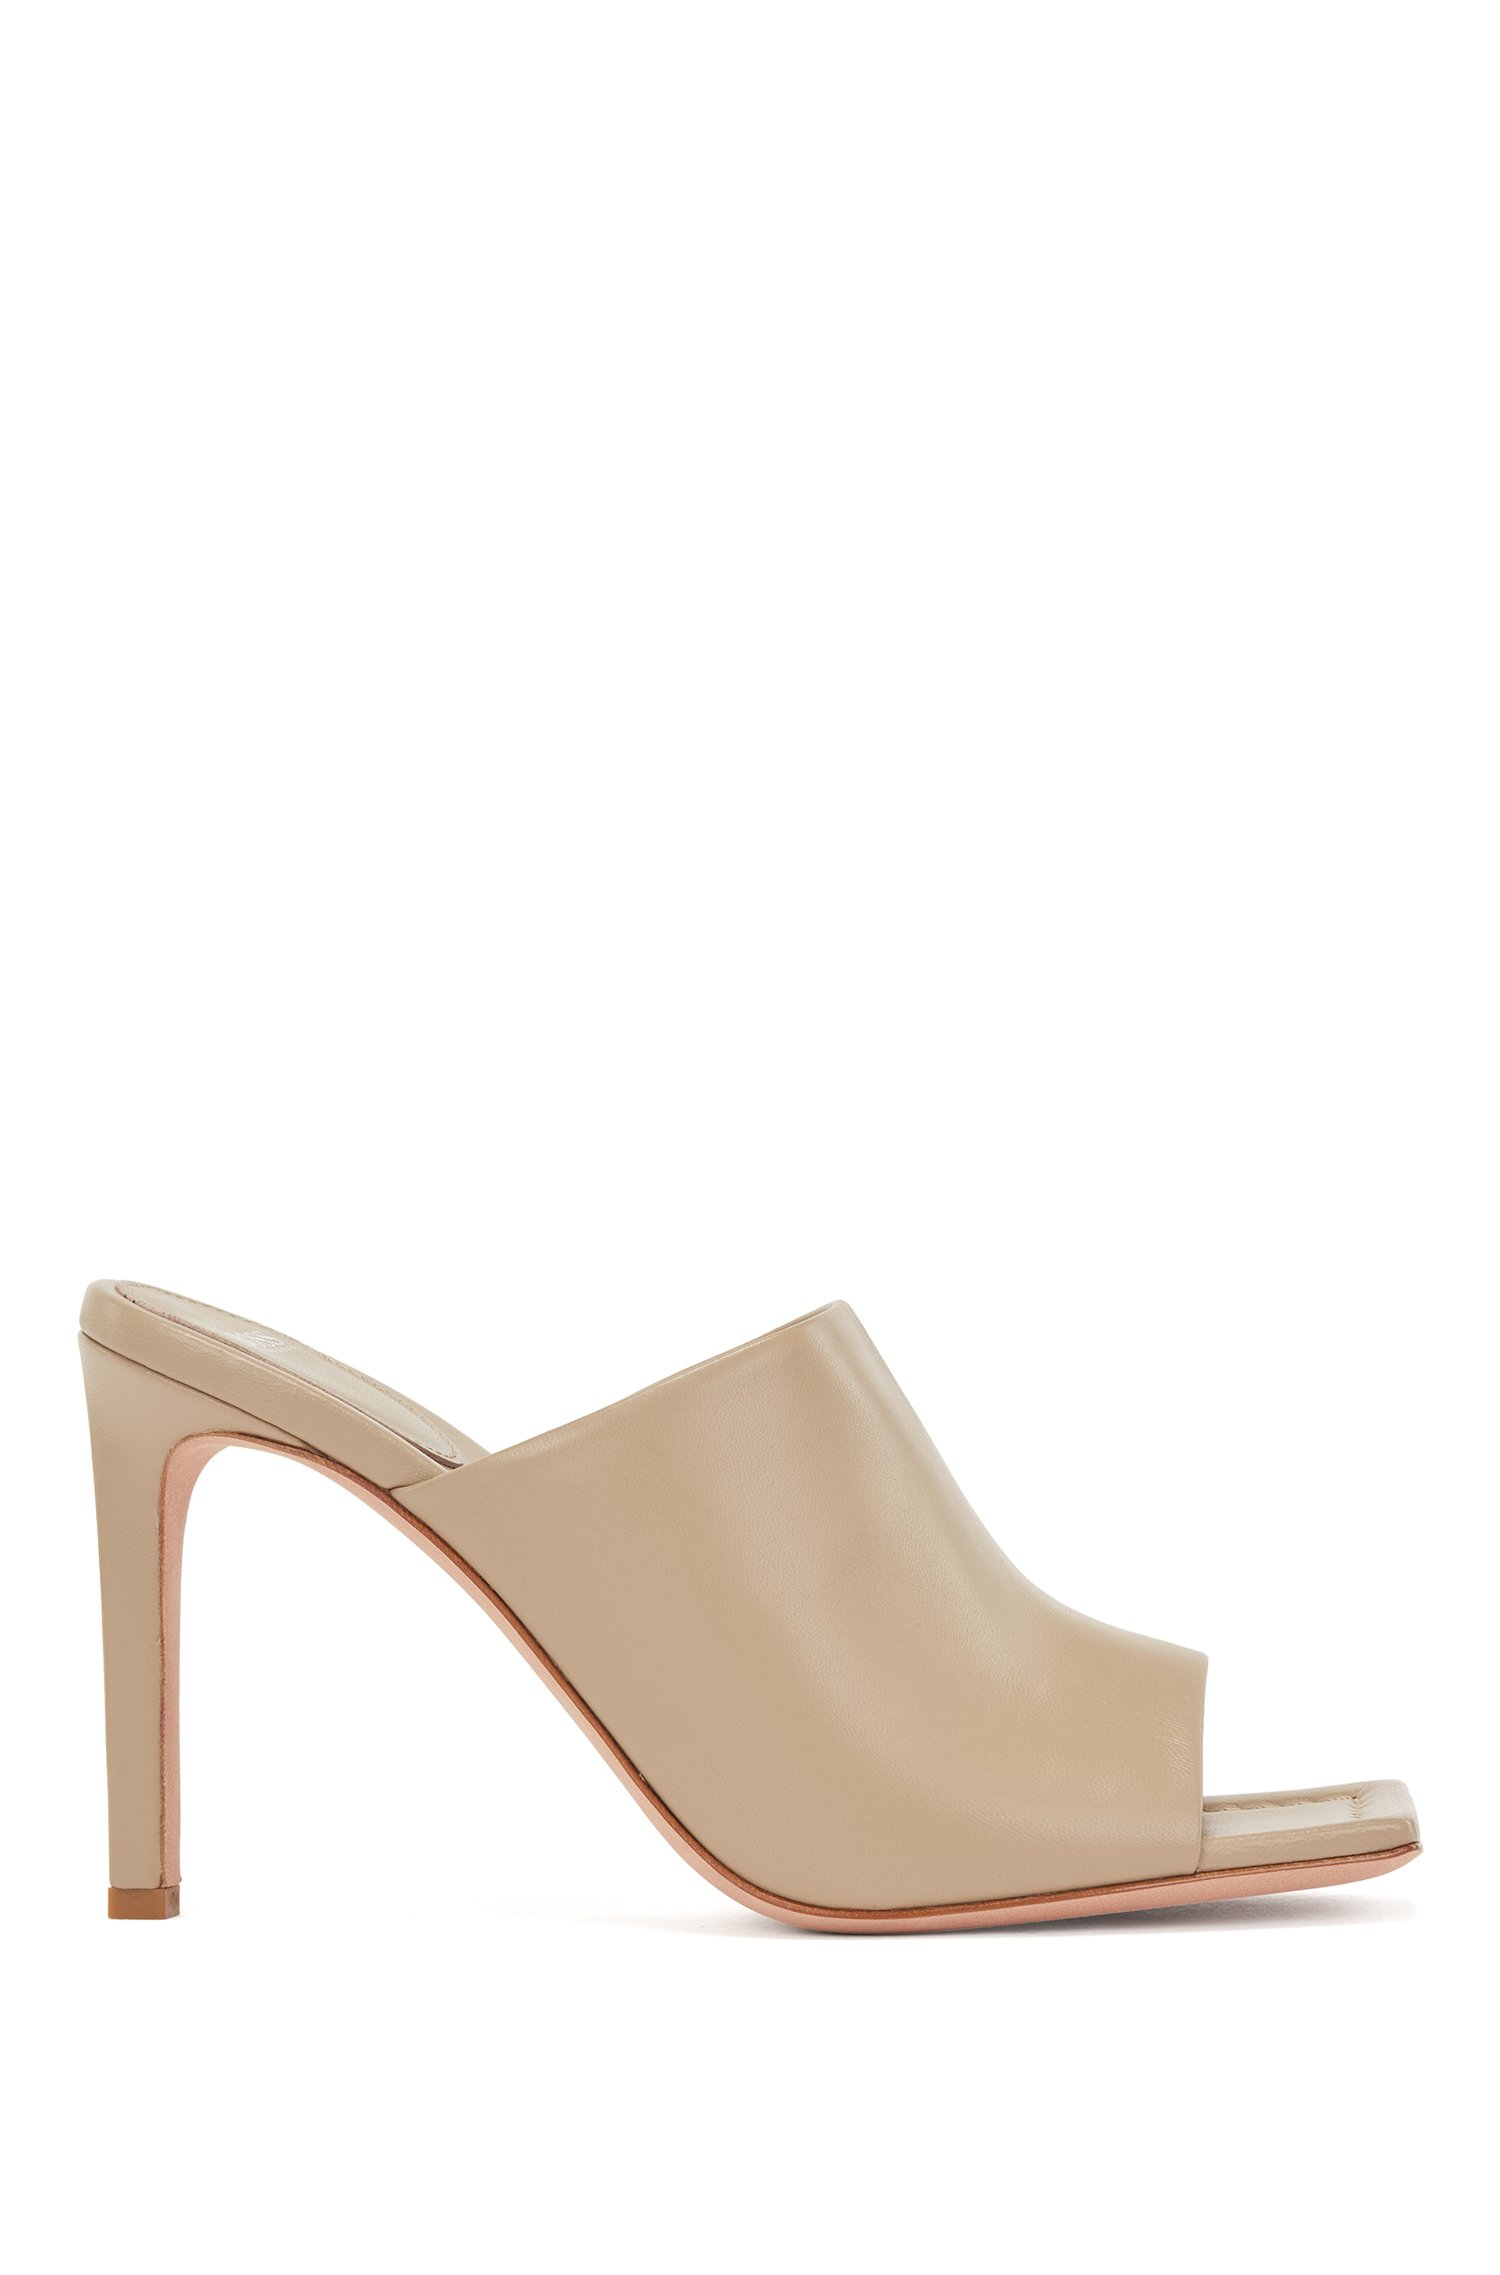 High-heeled mules in Italian leather, Beige